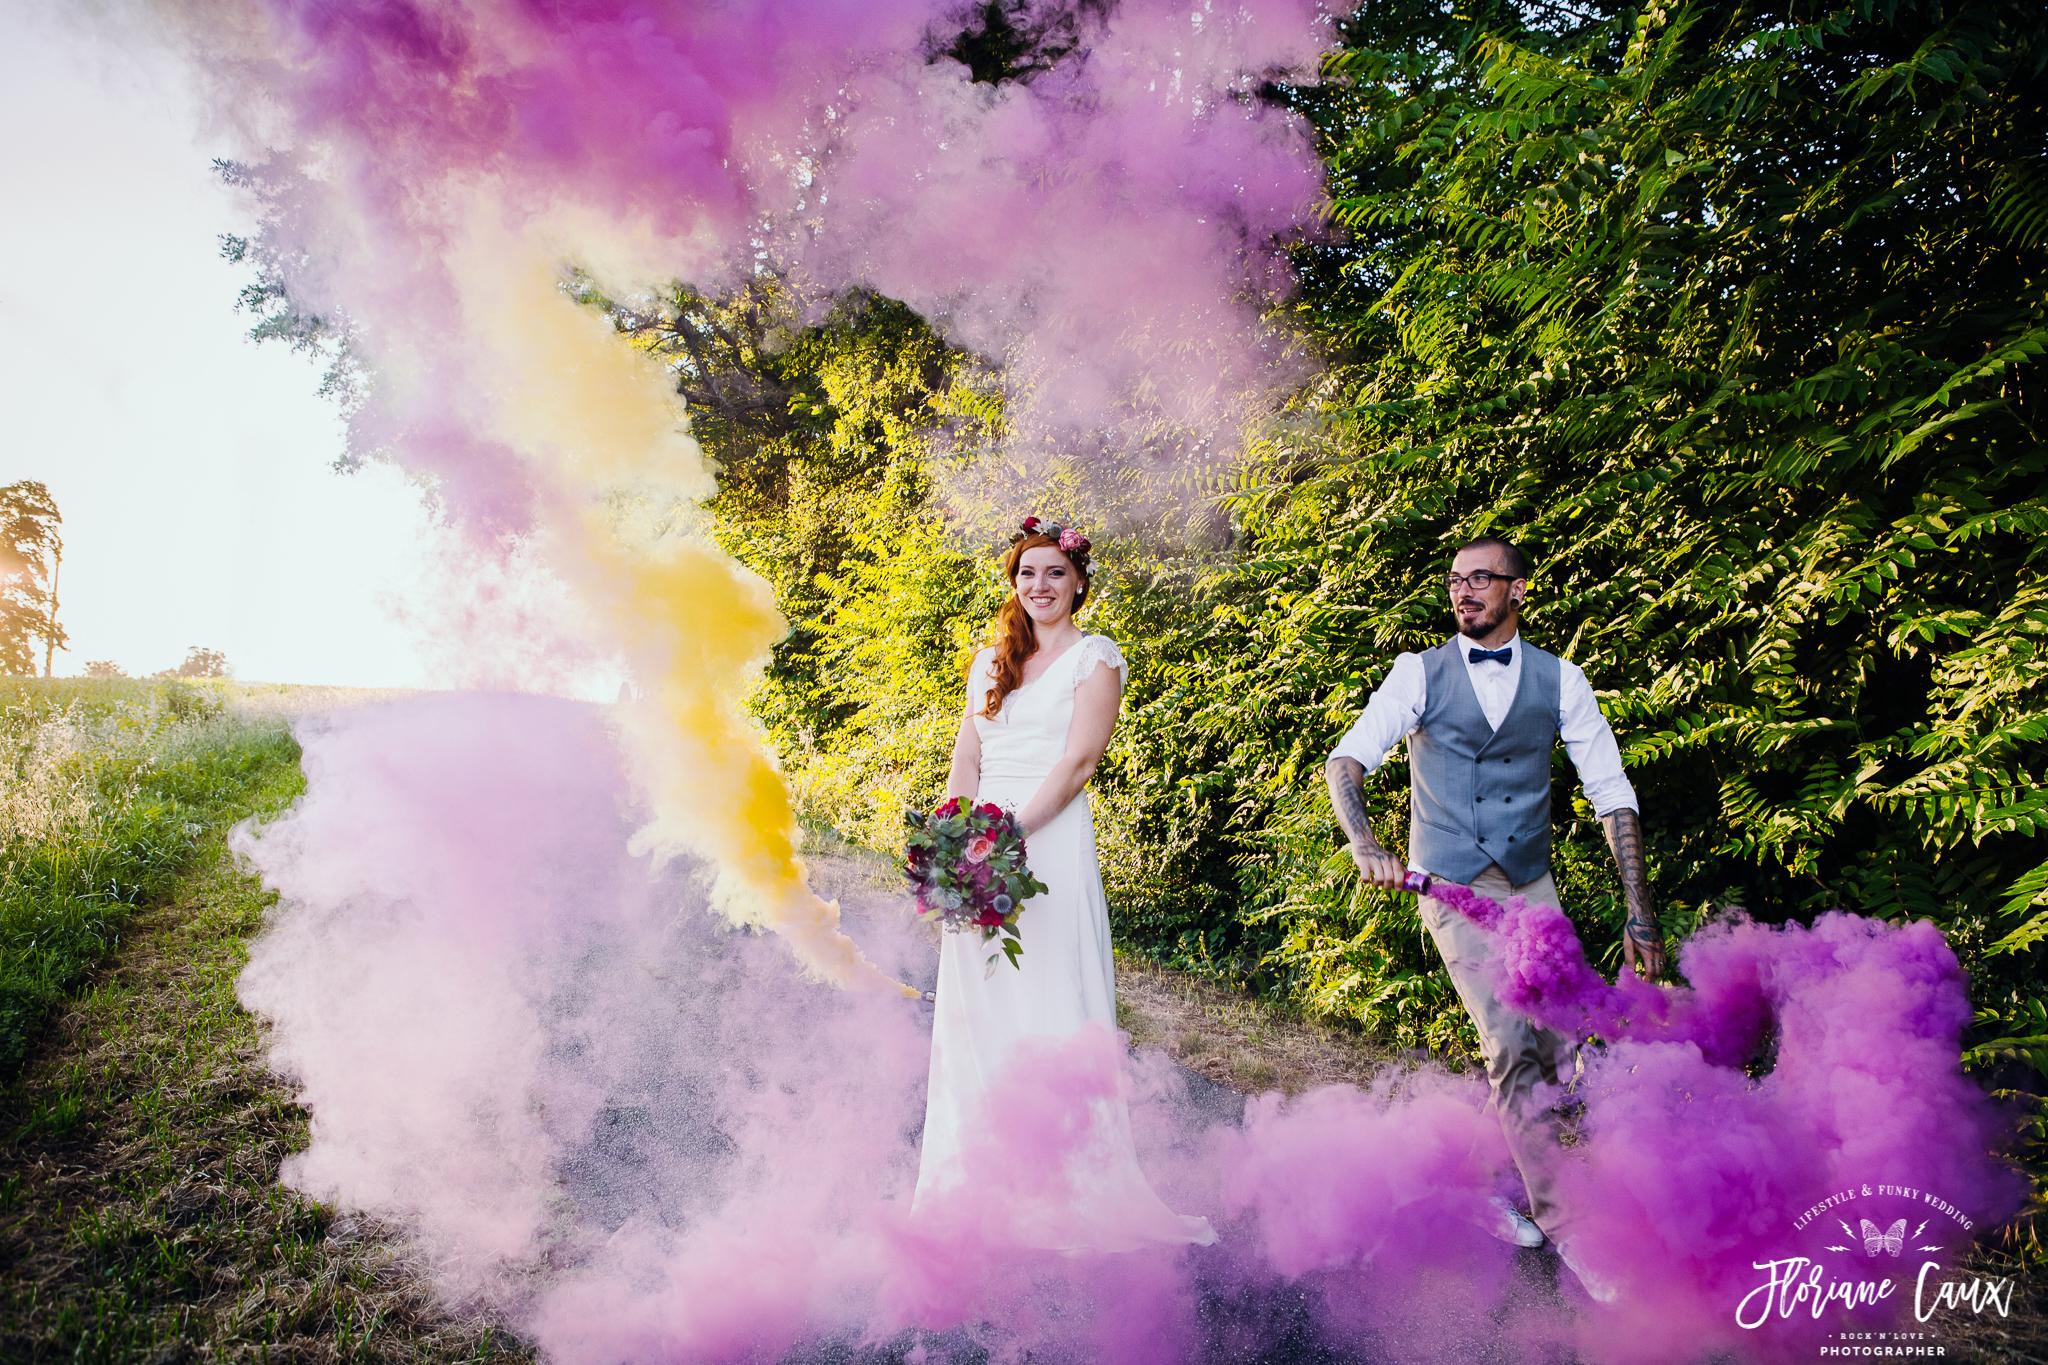 photographe-mariage-toulouse-rocknroll-maries-tatoues-floriane-caux-65